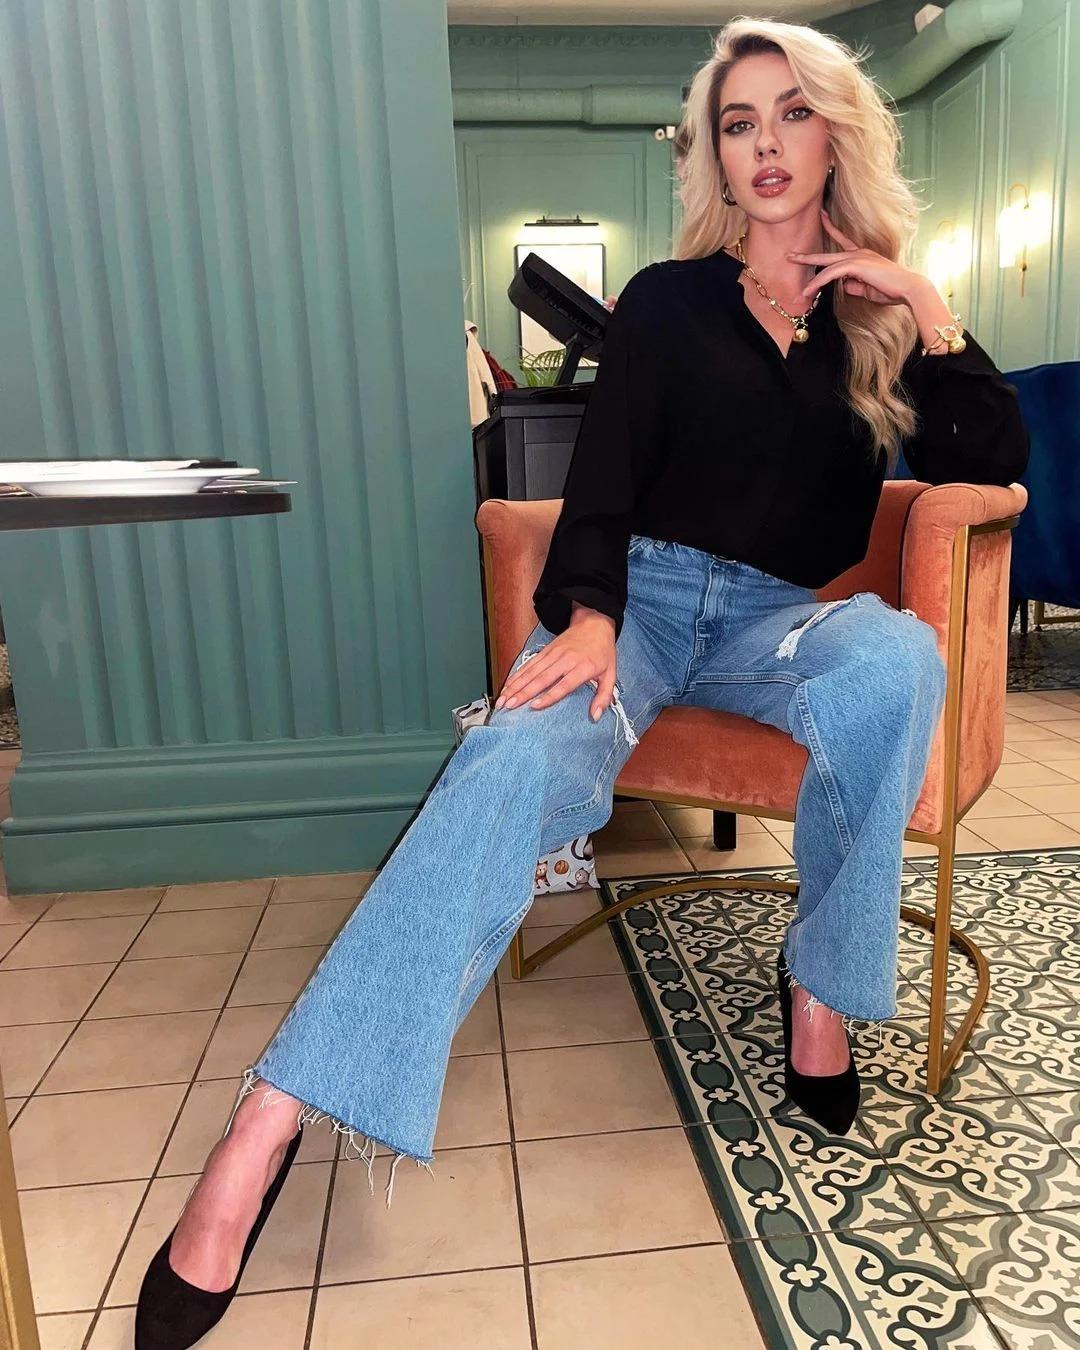 Ekaterina, la tiktoker idéntica a Scarlett Johansson